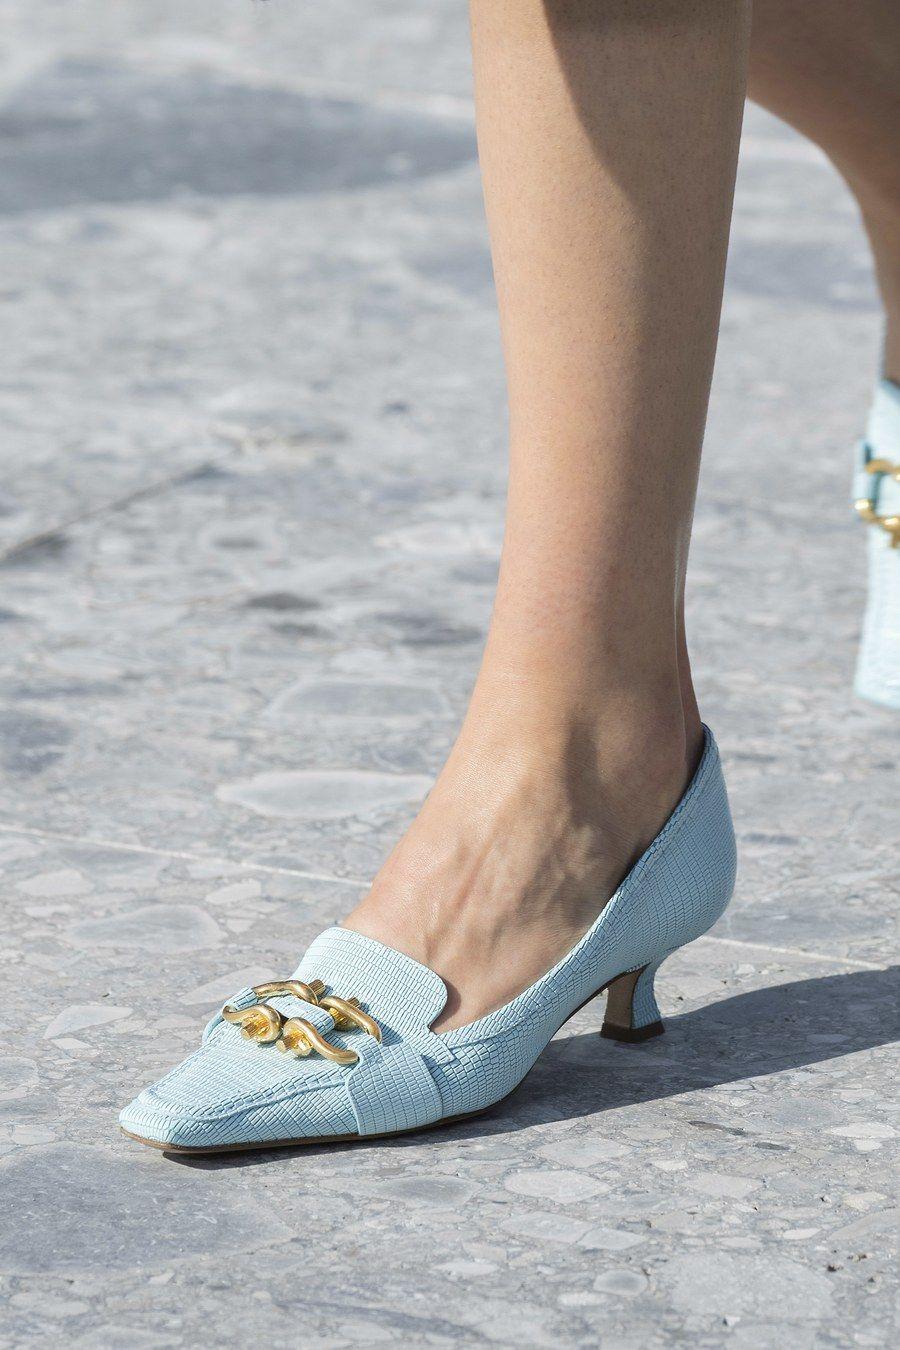 Bottega Veneta Fall 2019 Ready-to-Wear